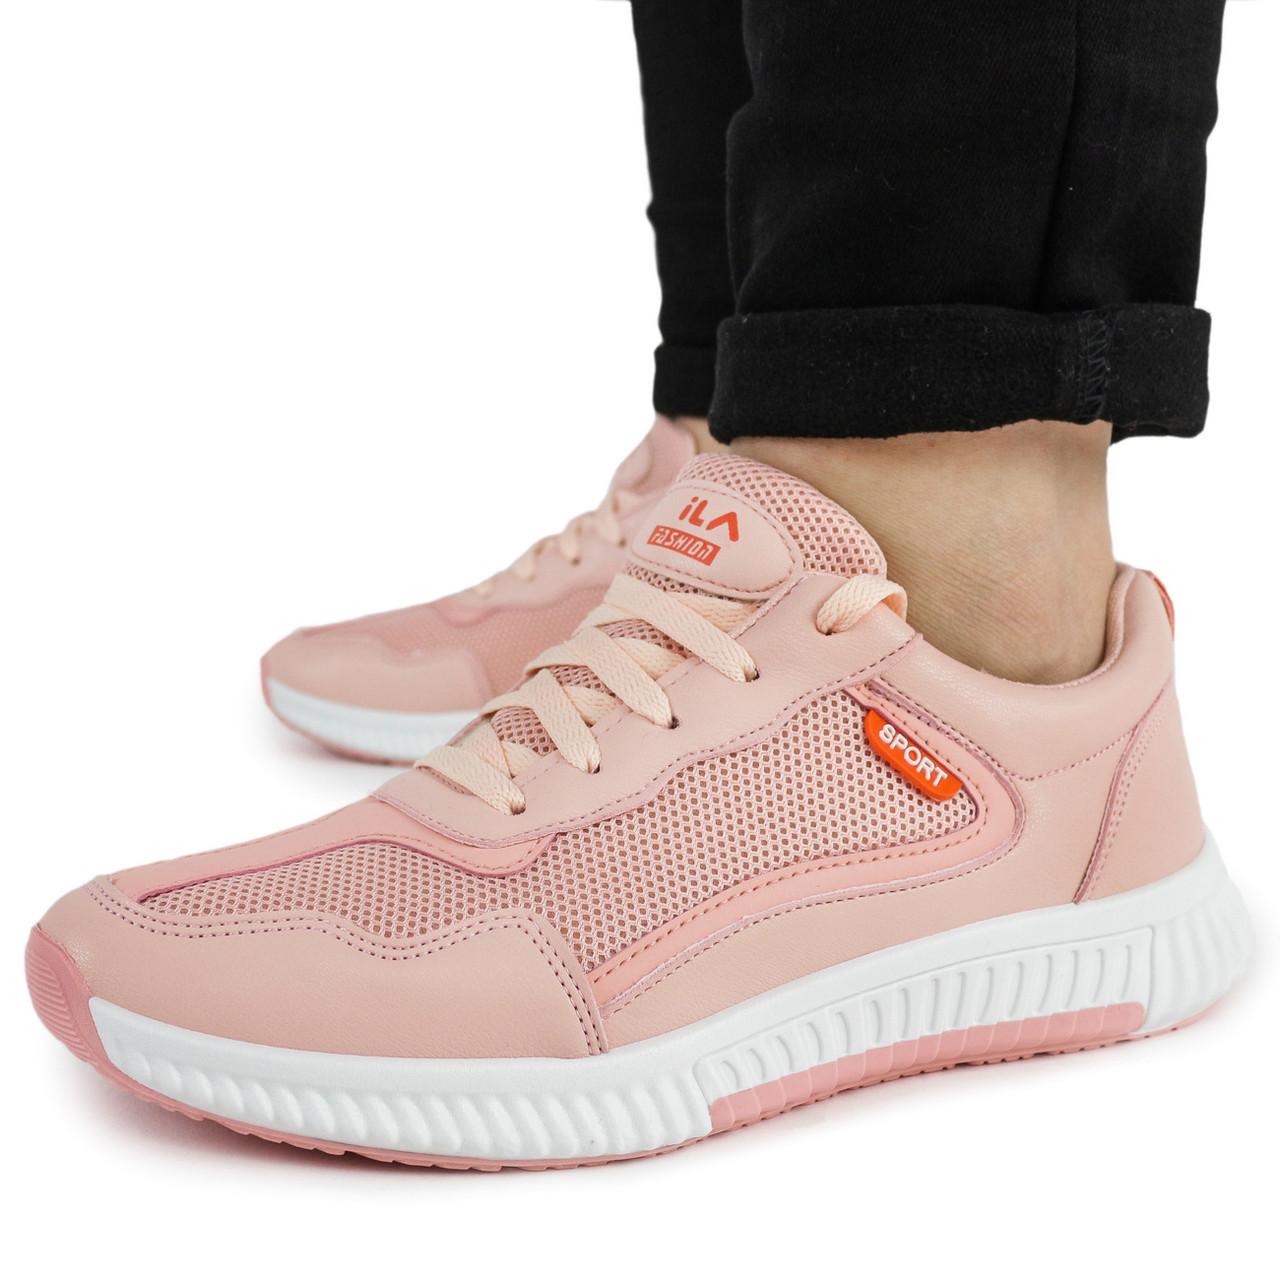 Кроссовки ILA Fashion женские розовые 37 р. 24,5 см (1145235474)